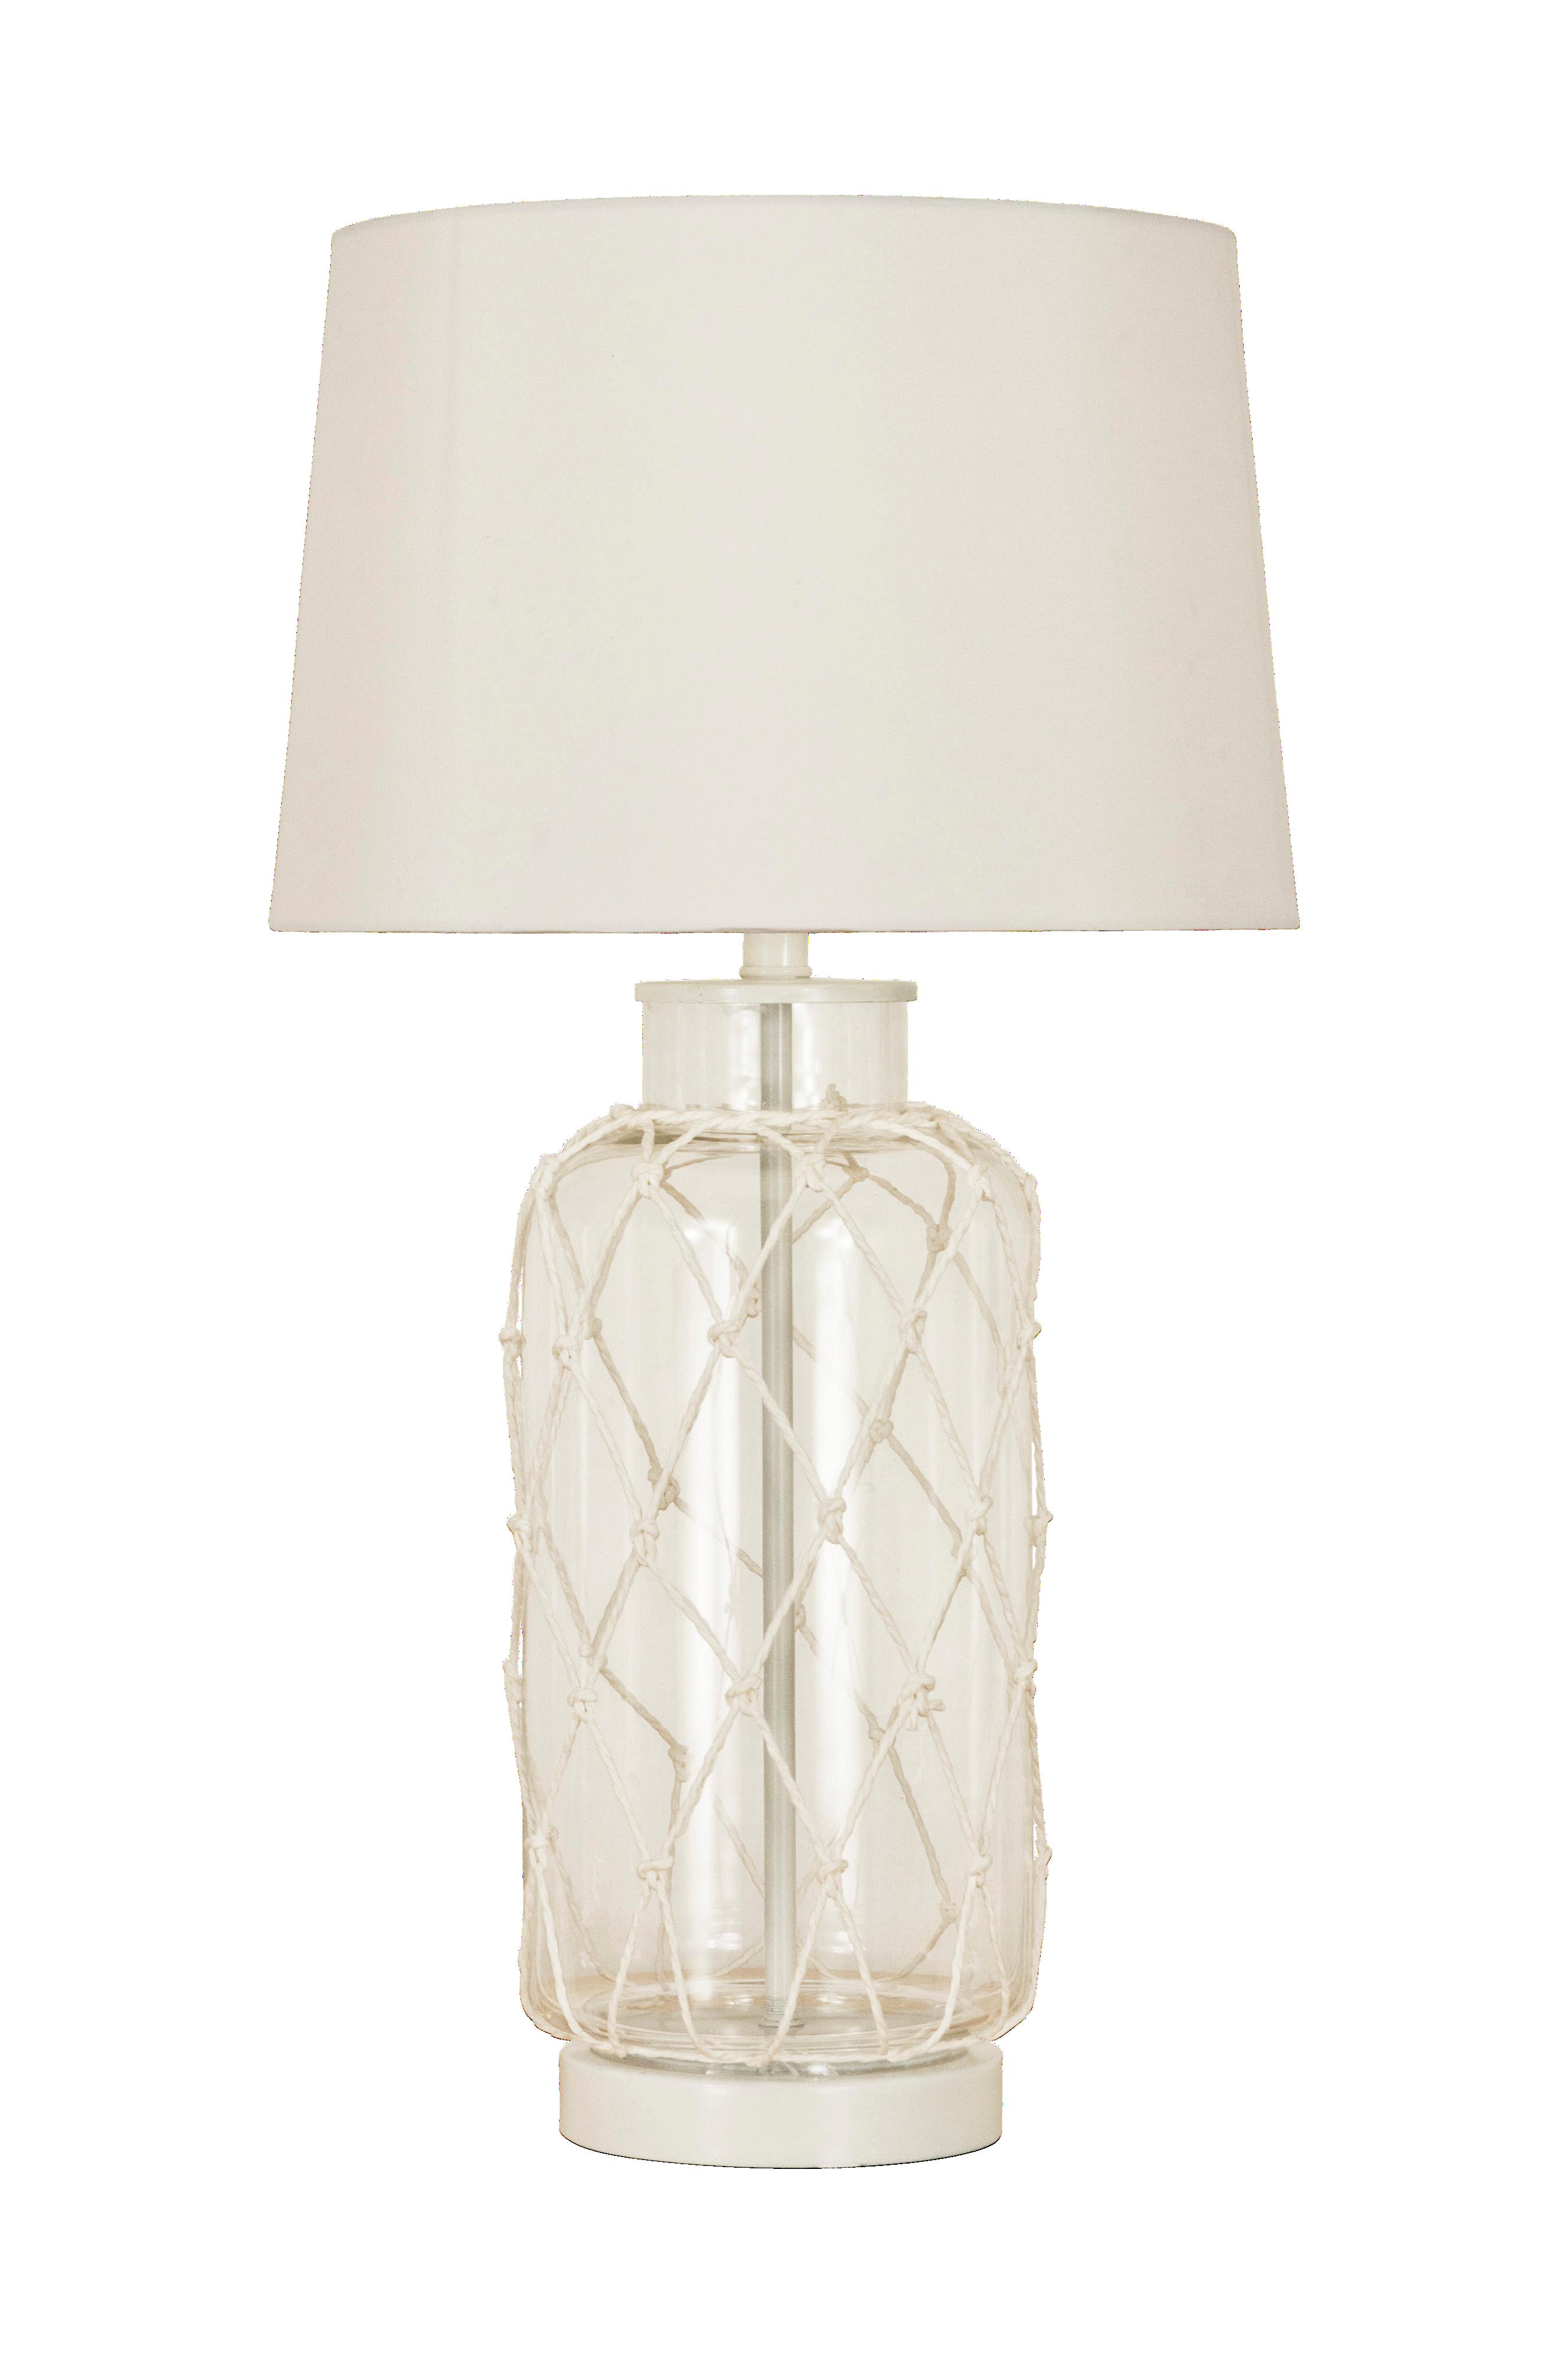 Aneta Taklampe Marine Glass Belysning Homeroom.no